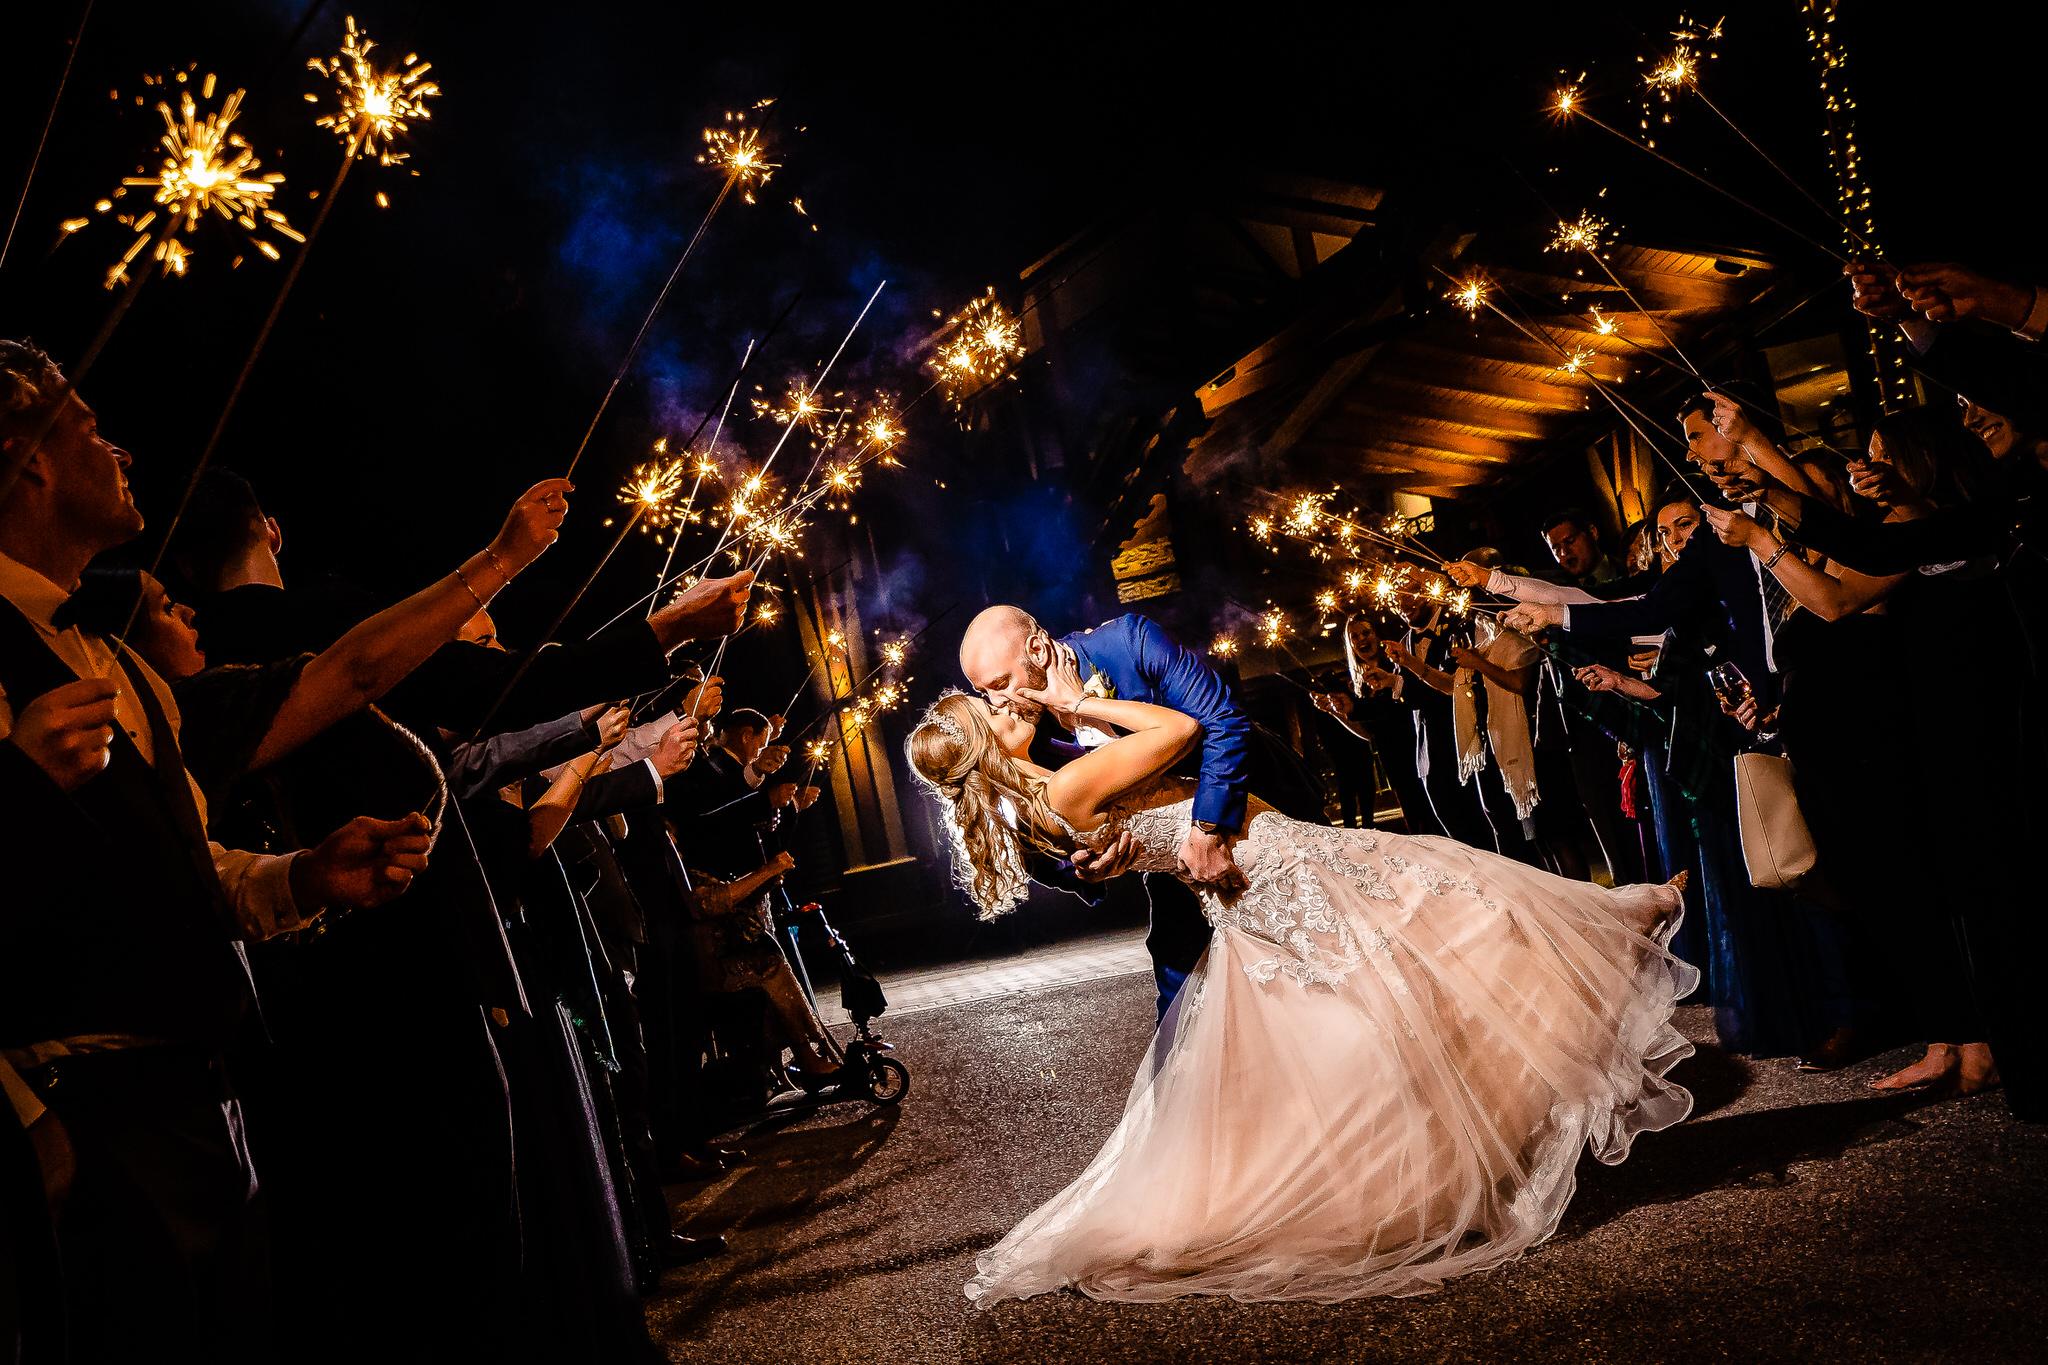 SMJ Photography, Wedding Photography, Wedding Sparkler Exit Photo, Wedding Couple Sparklers, Sparklers, Husband and Wife Wedding Photo, Wedding Sparklers